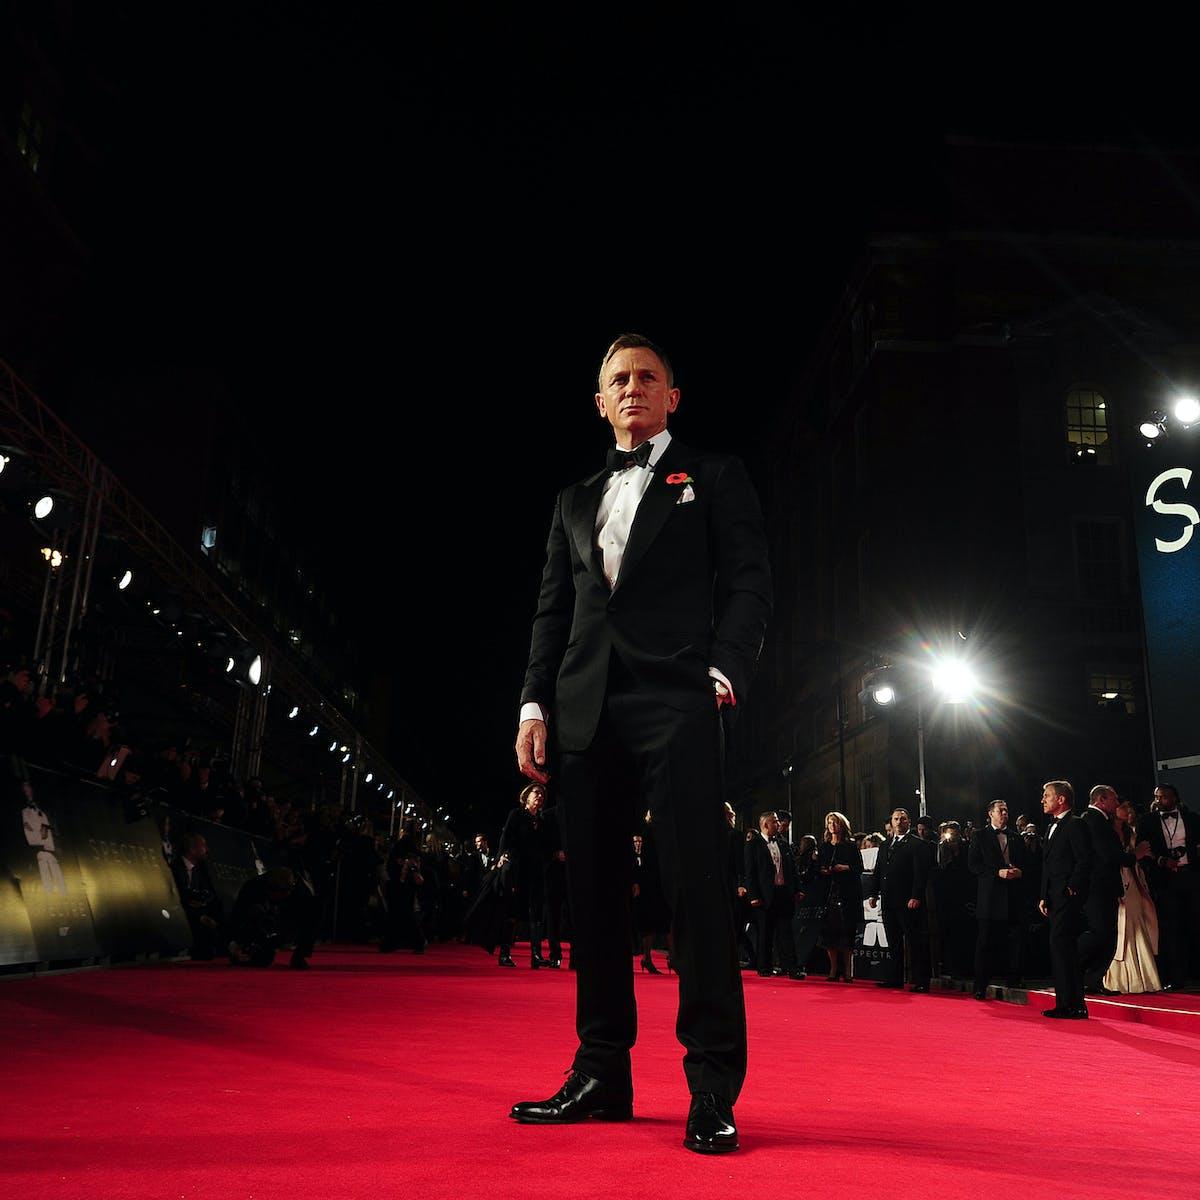 James Bond needs a new attitude, not a new actor